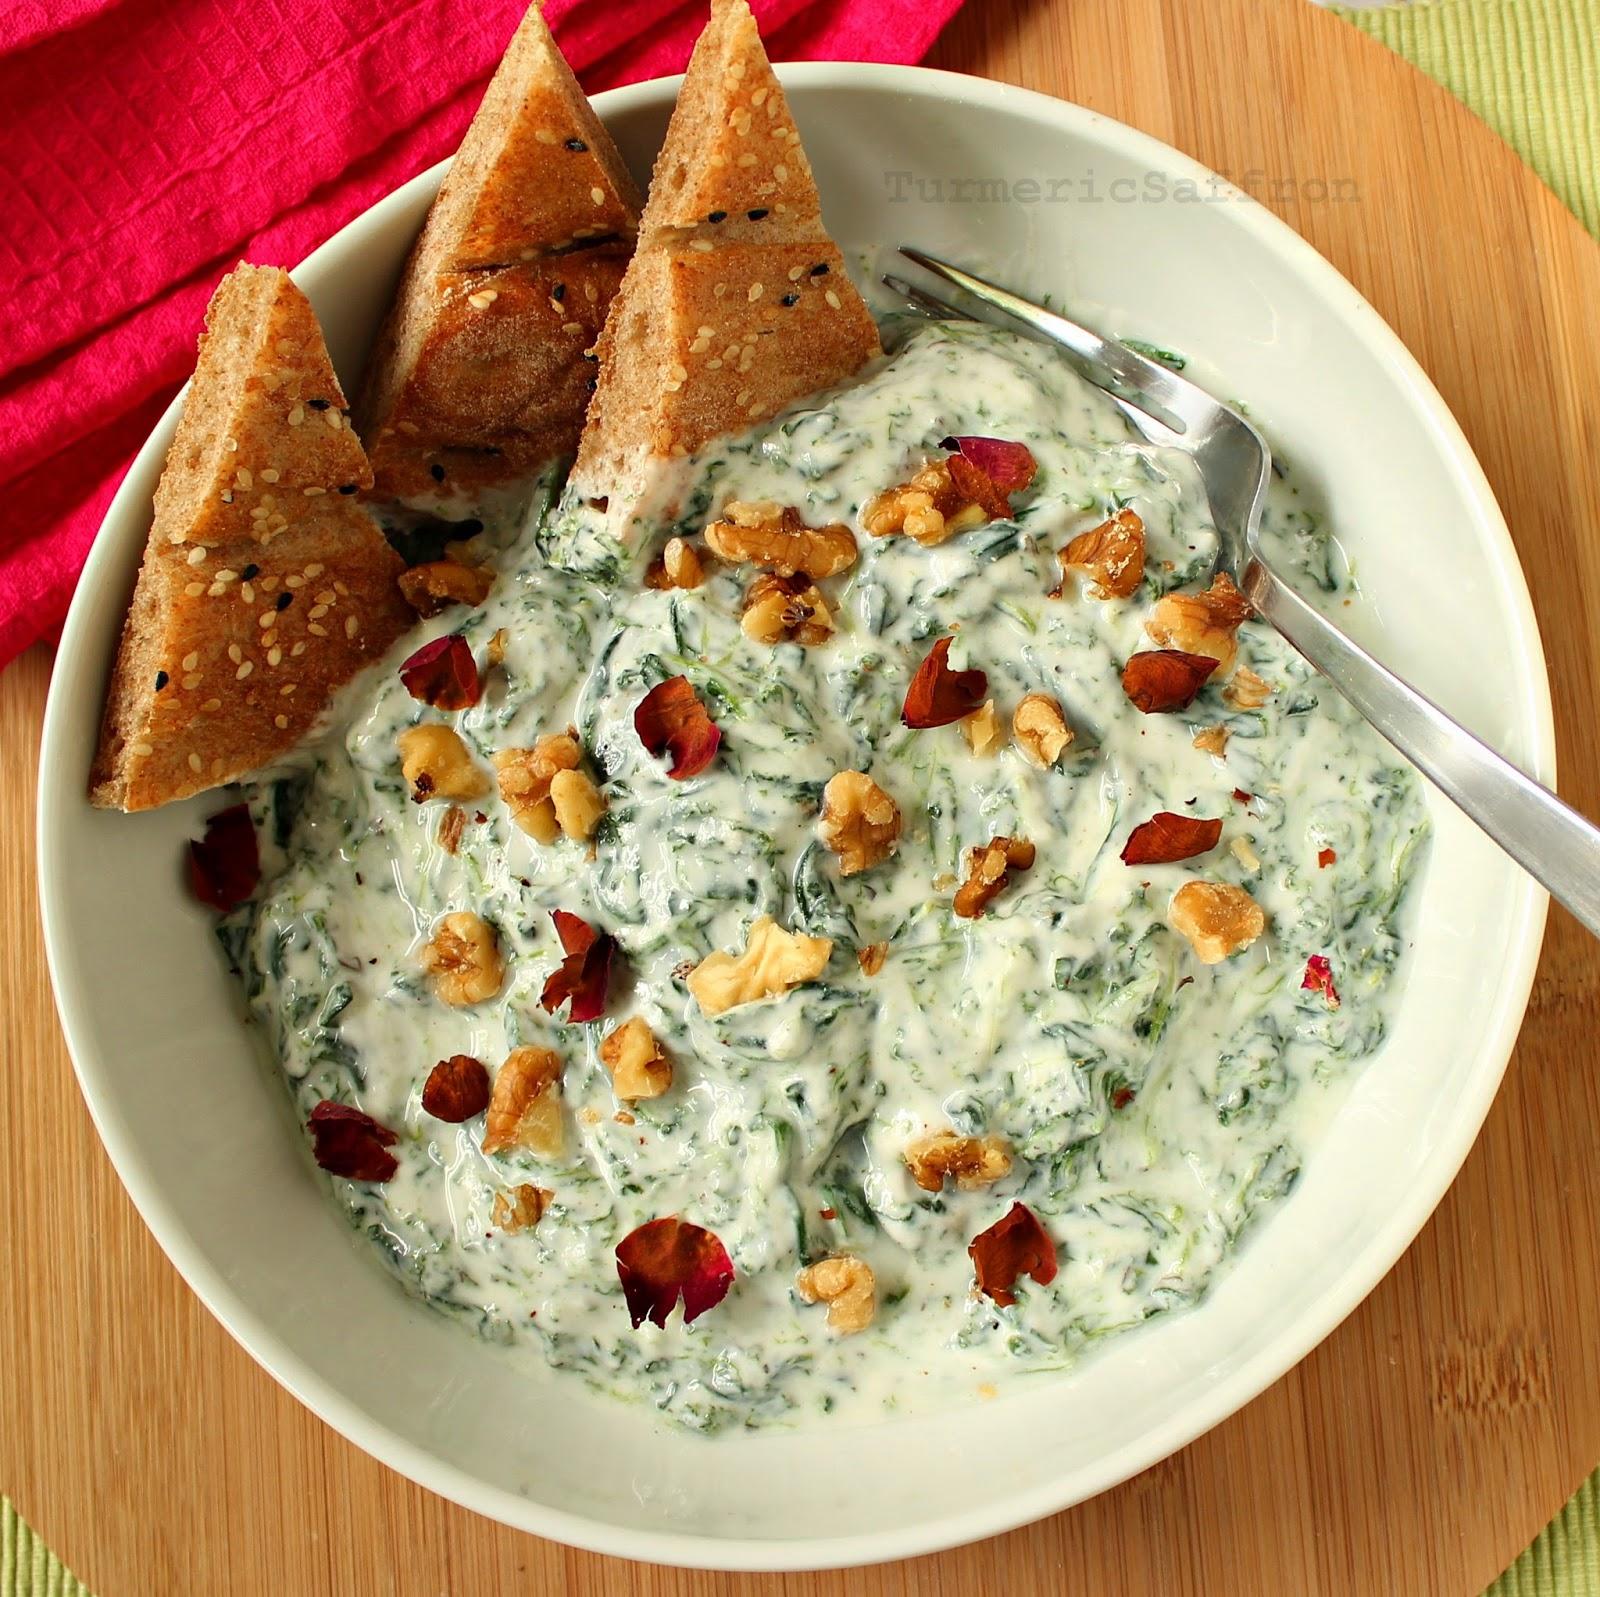 Turmeric & Saffron: Mast Esfenaj - Persian Yogurt and ...